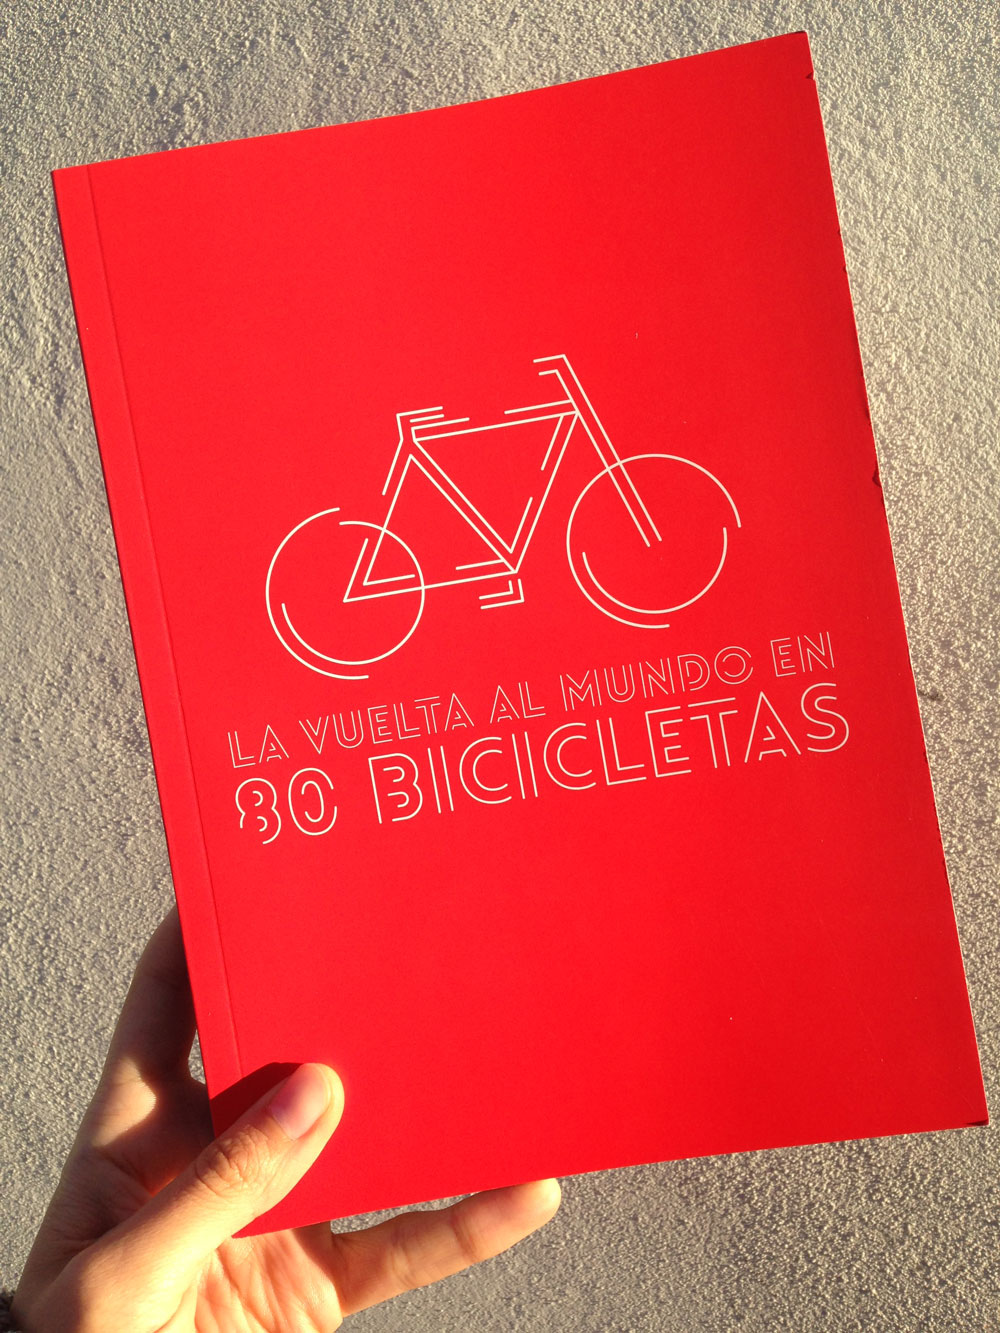 80 bicicletas1